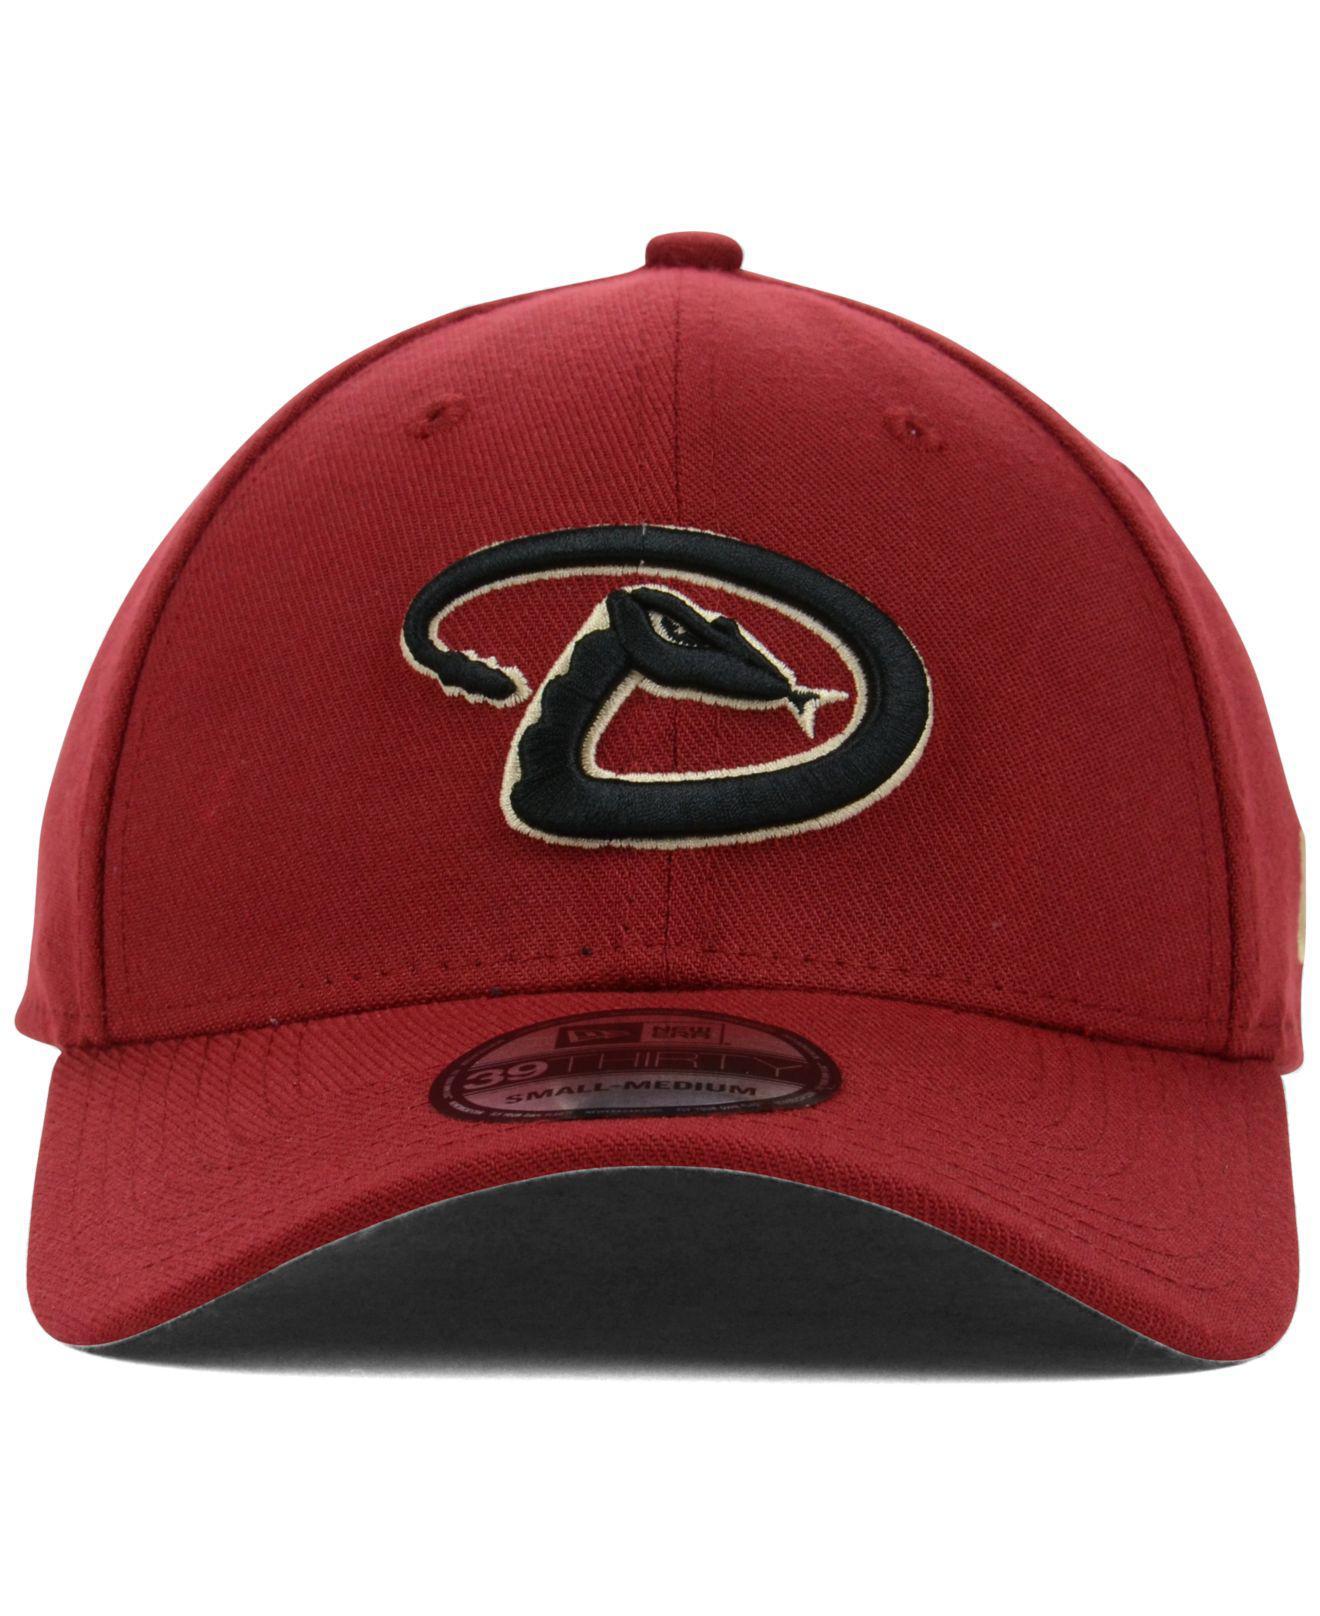 cheap for discount 29d27 79a55 Lyst - KTZ Arizona Diamondbacks Mlb Team Classic 39thirty Cap in Red for Men